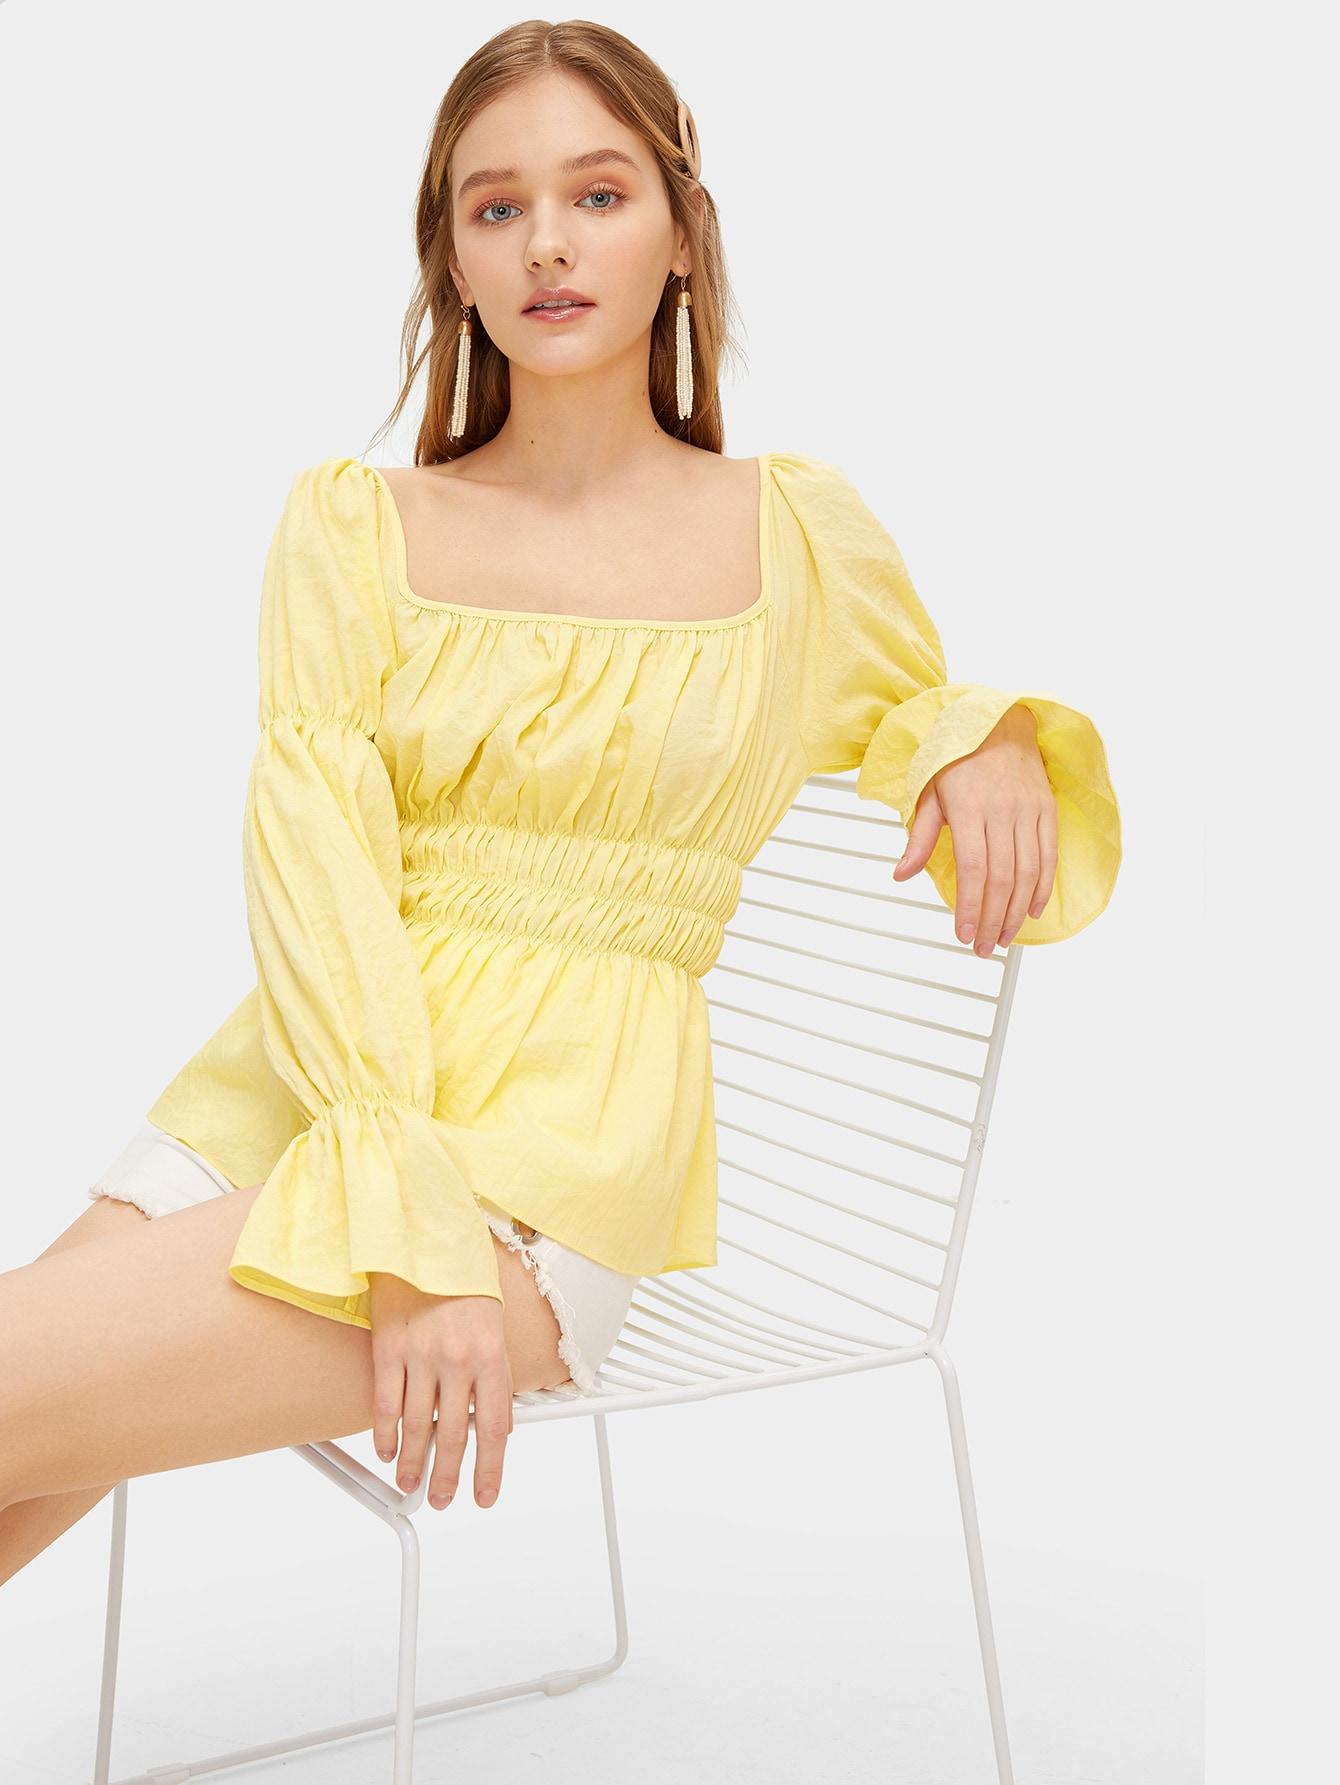 Square Neck Elasticized Sleeve Shirred Peplum Top by Romwe